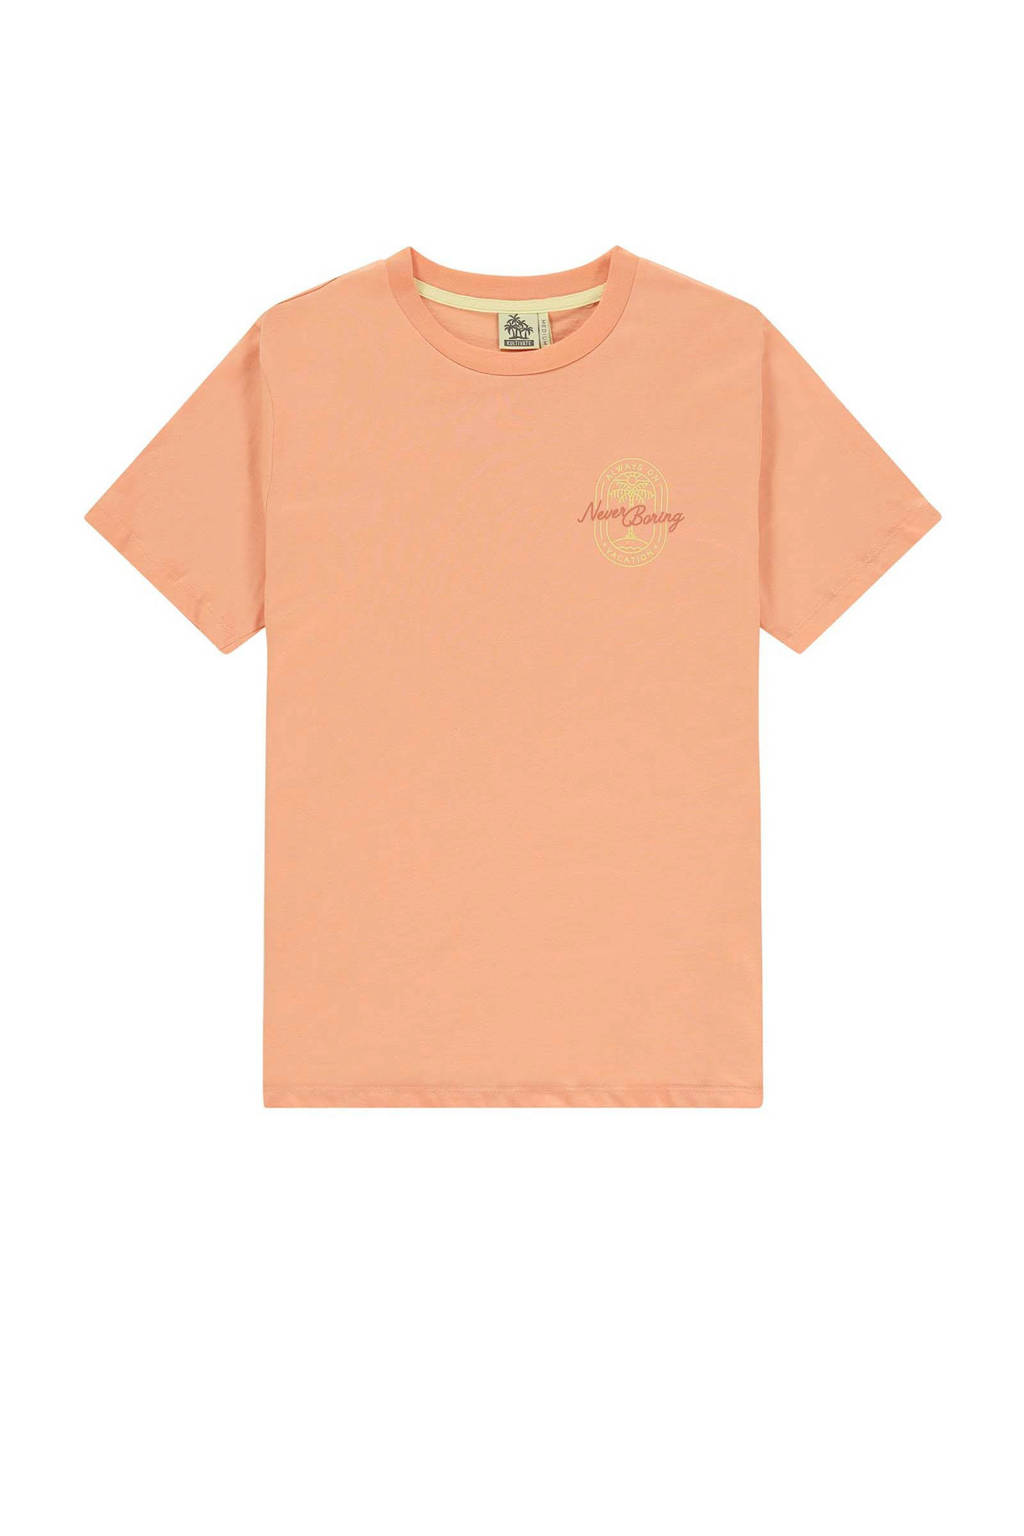 Kultivate T-shirt met printopdruk oranje/geel, Oranje/geel